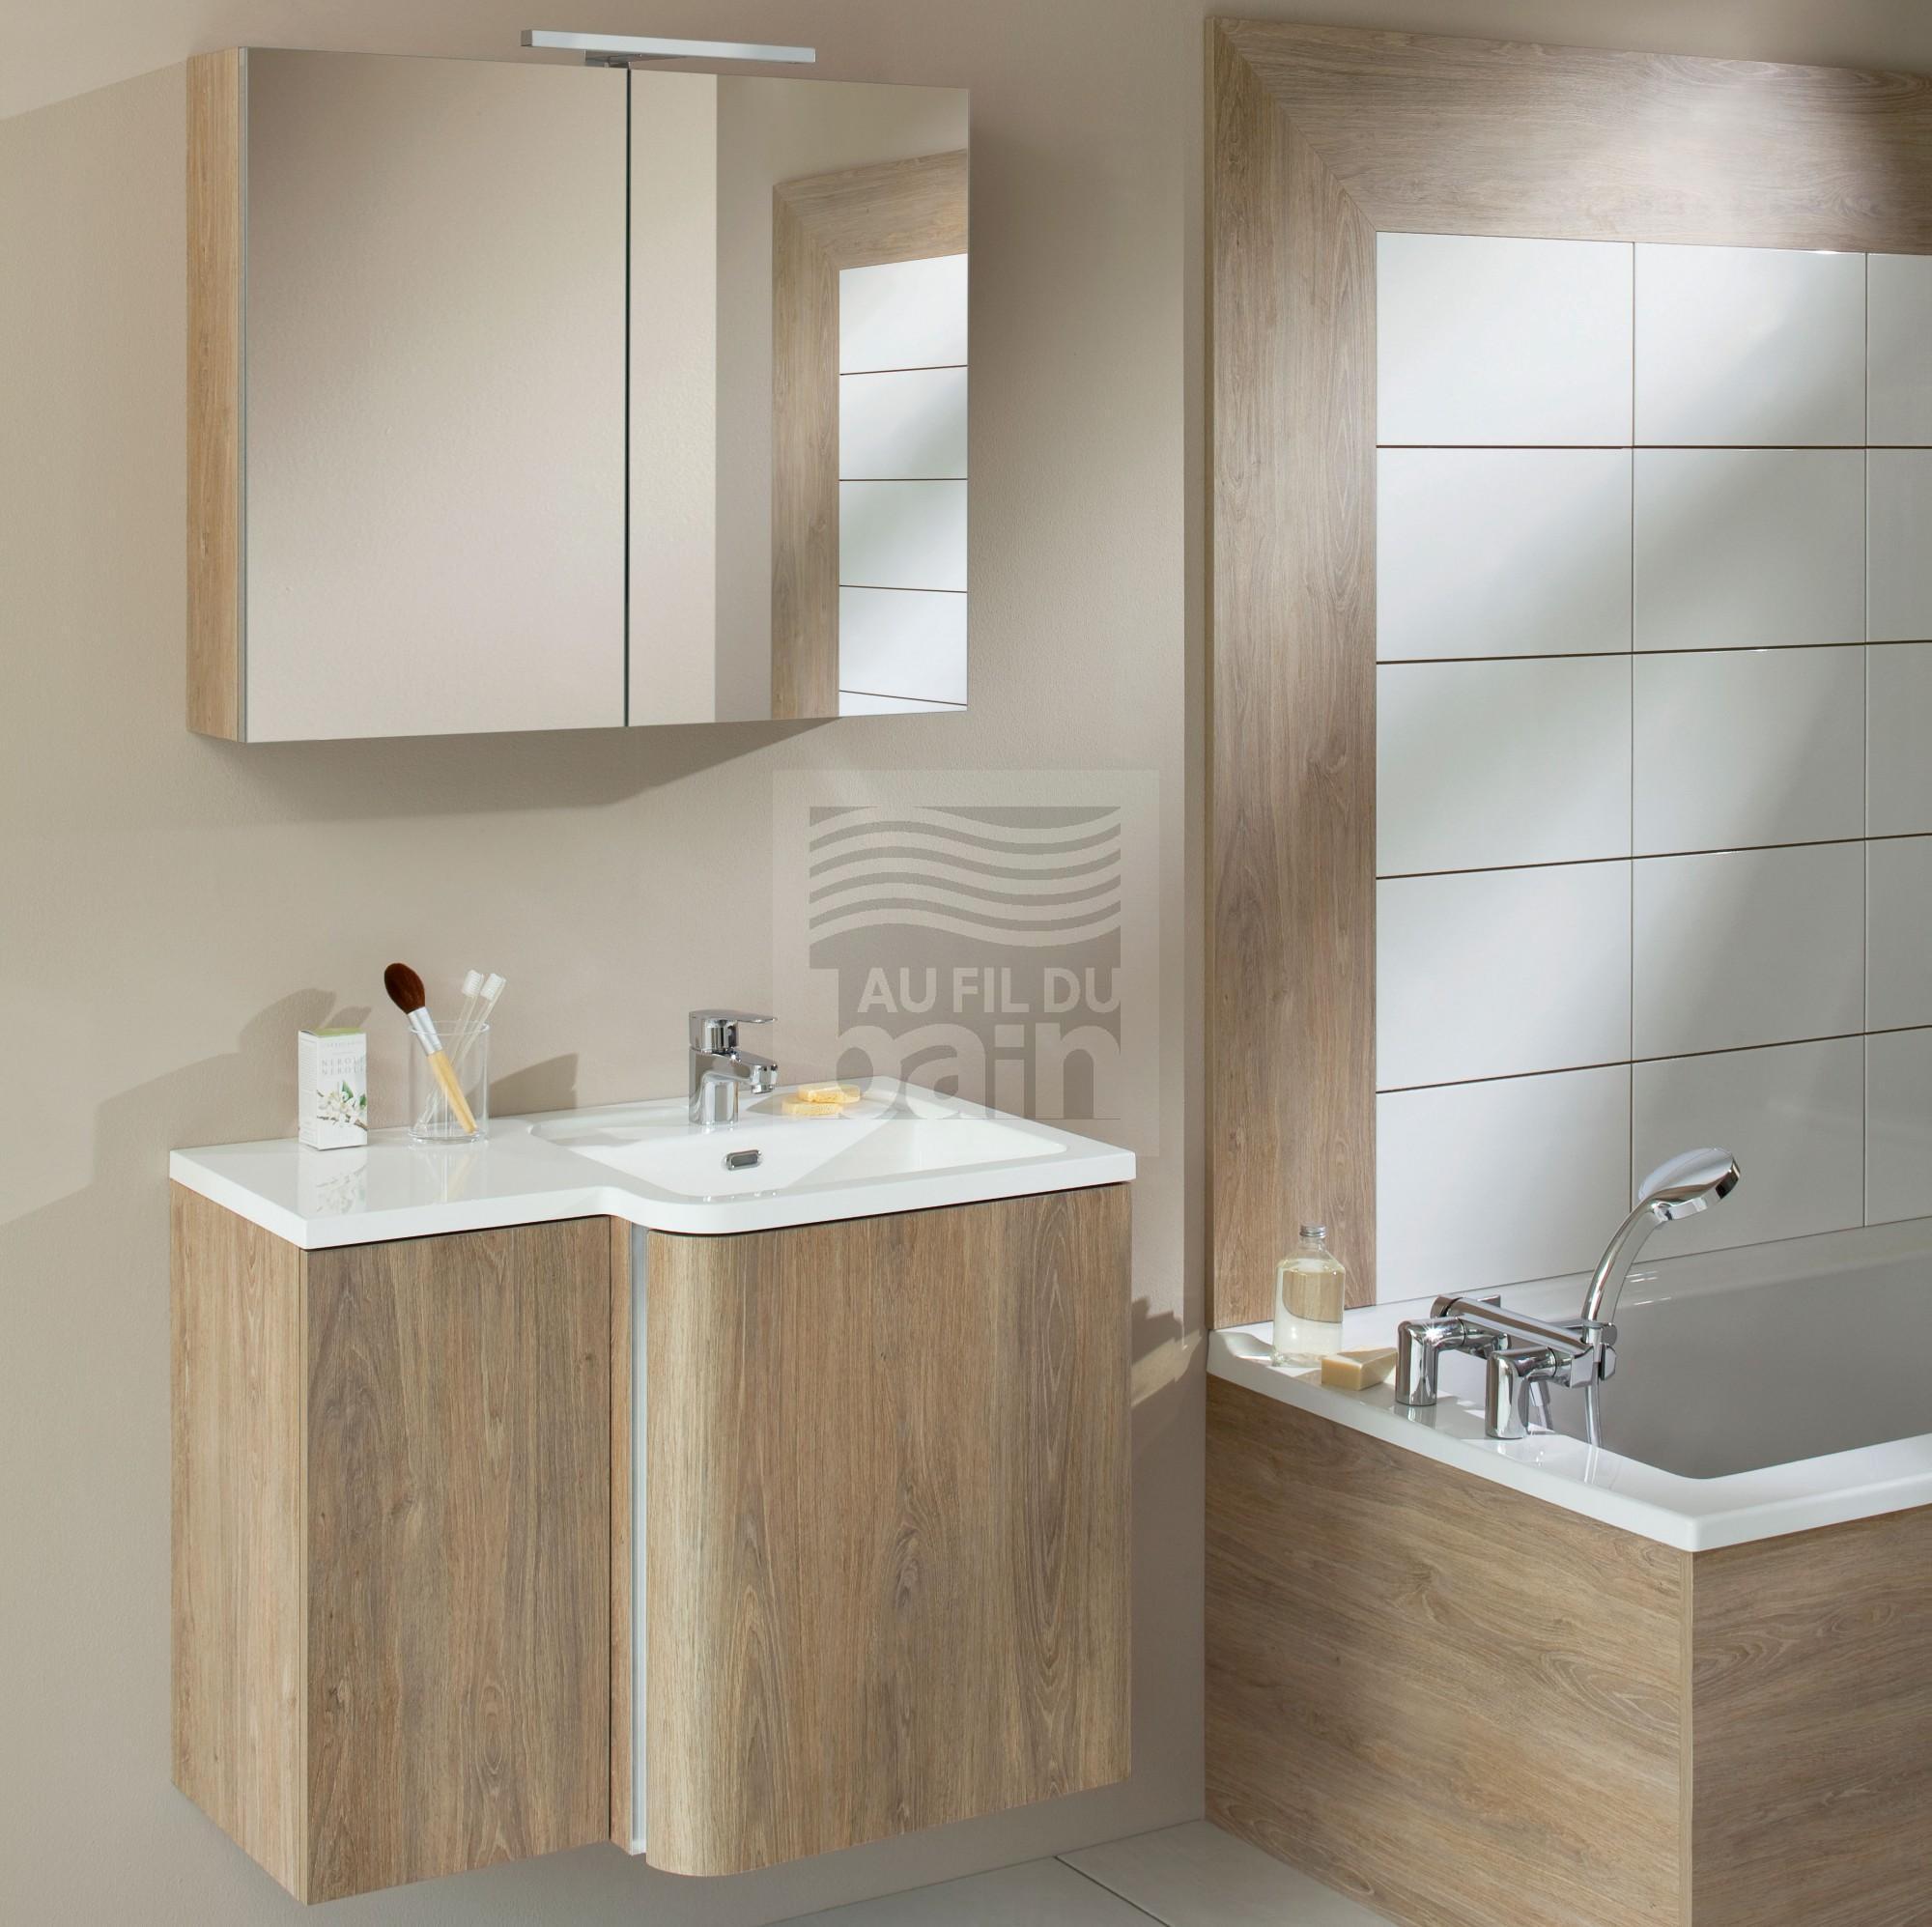 Vasque avec meuble salle de bain - maison parallele